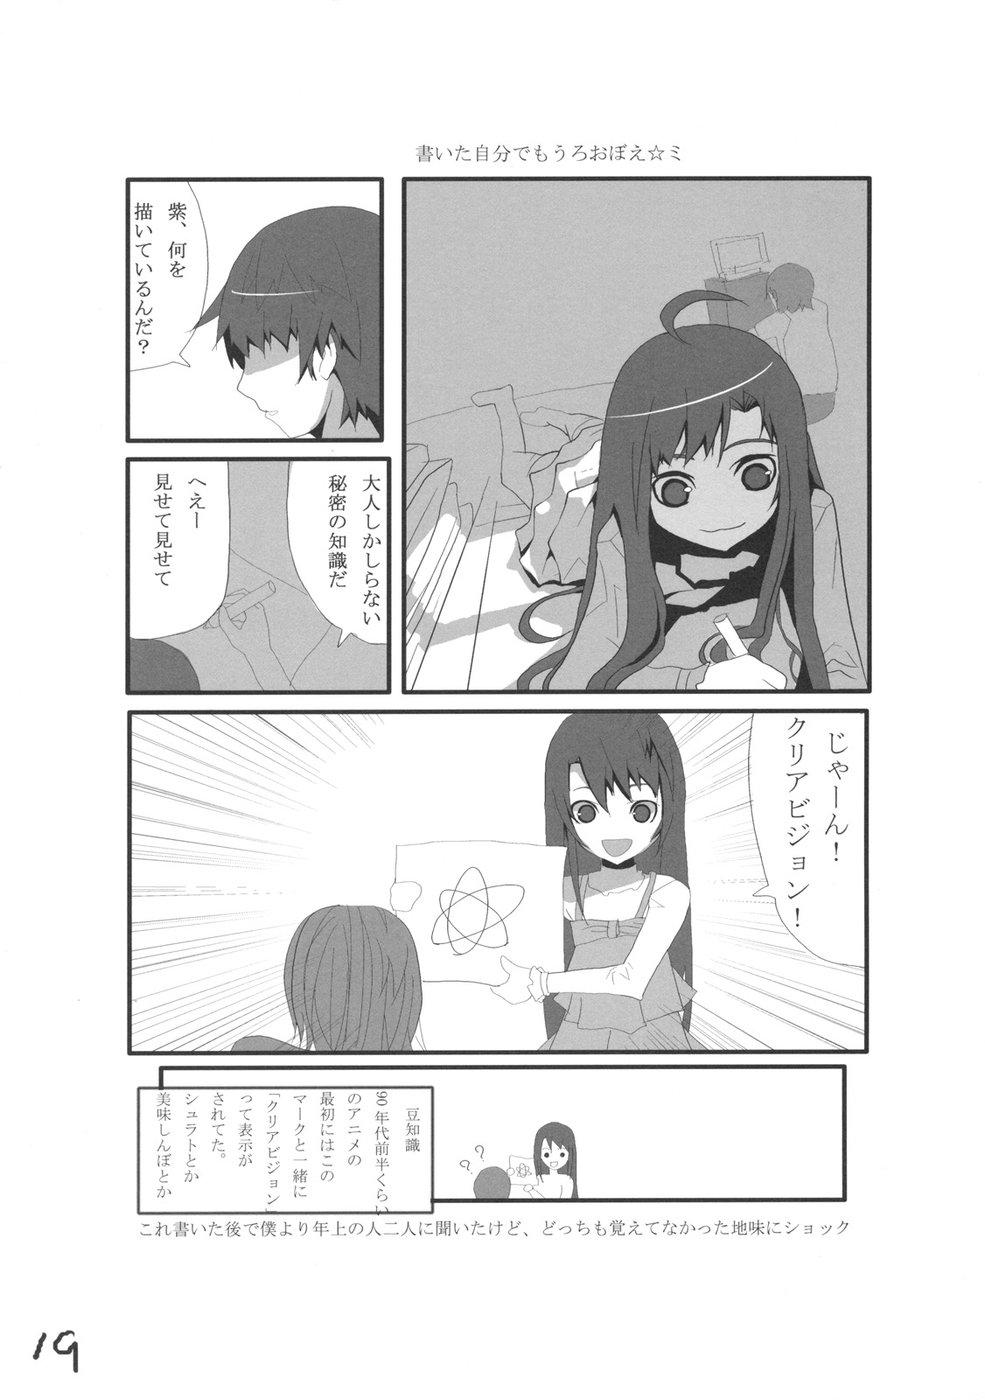 Kocchi no Murasaki 17